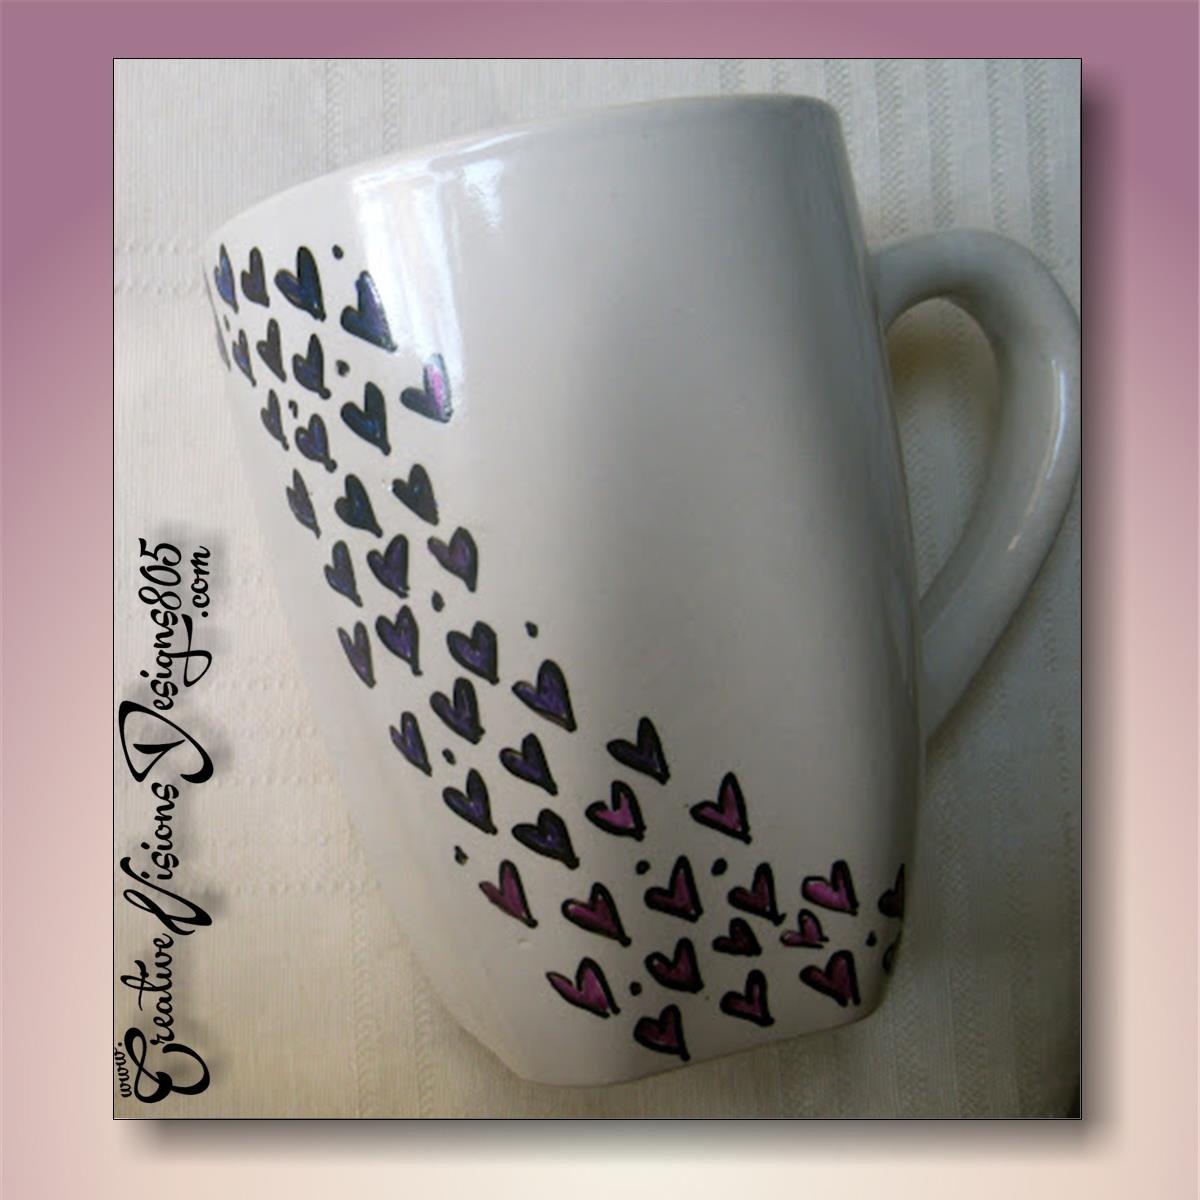 FOLLOW THE HEARTS - hand decorated coffee mug